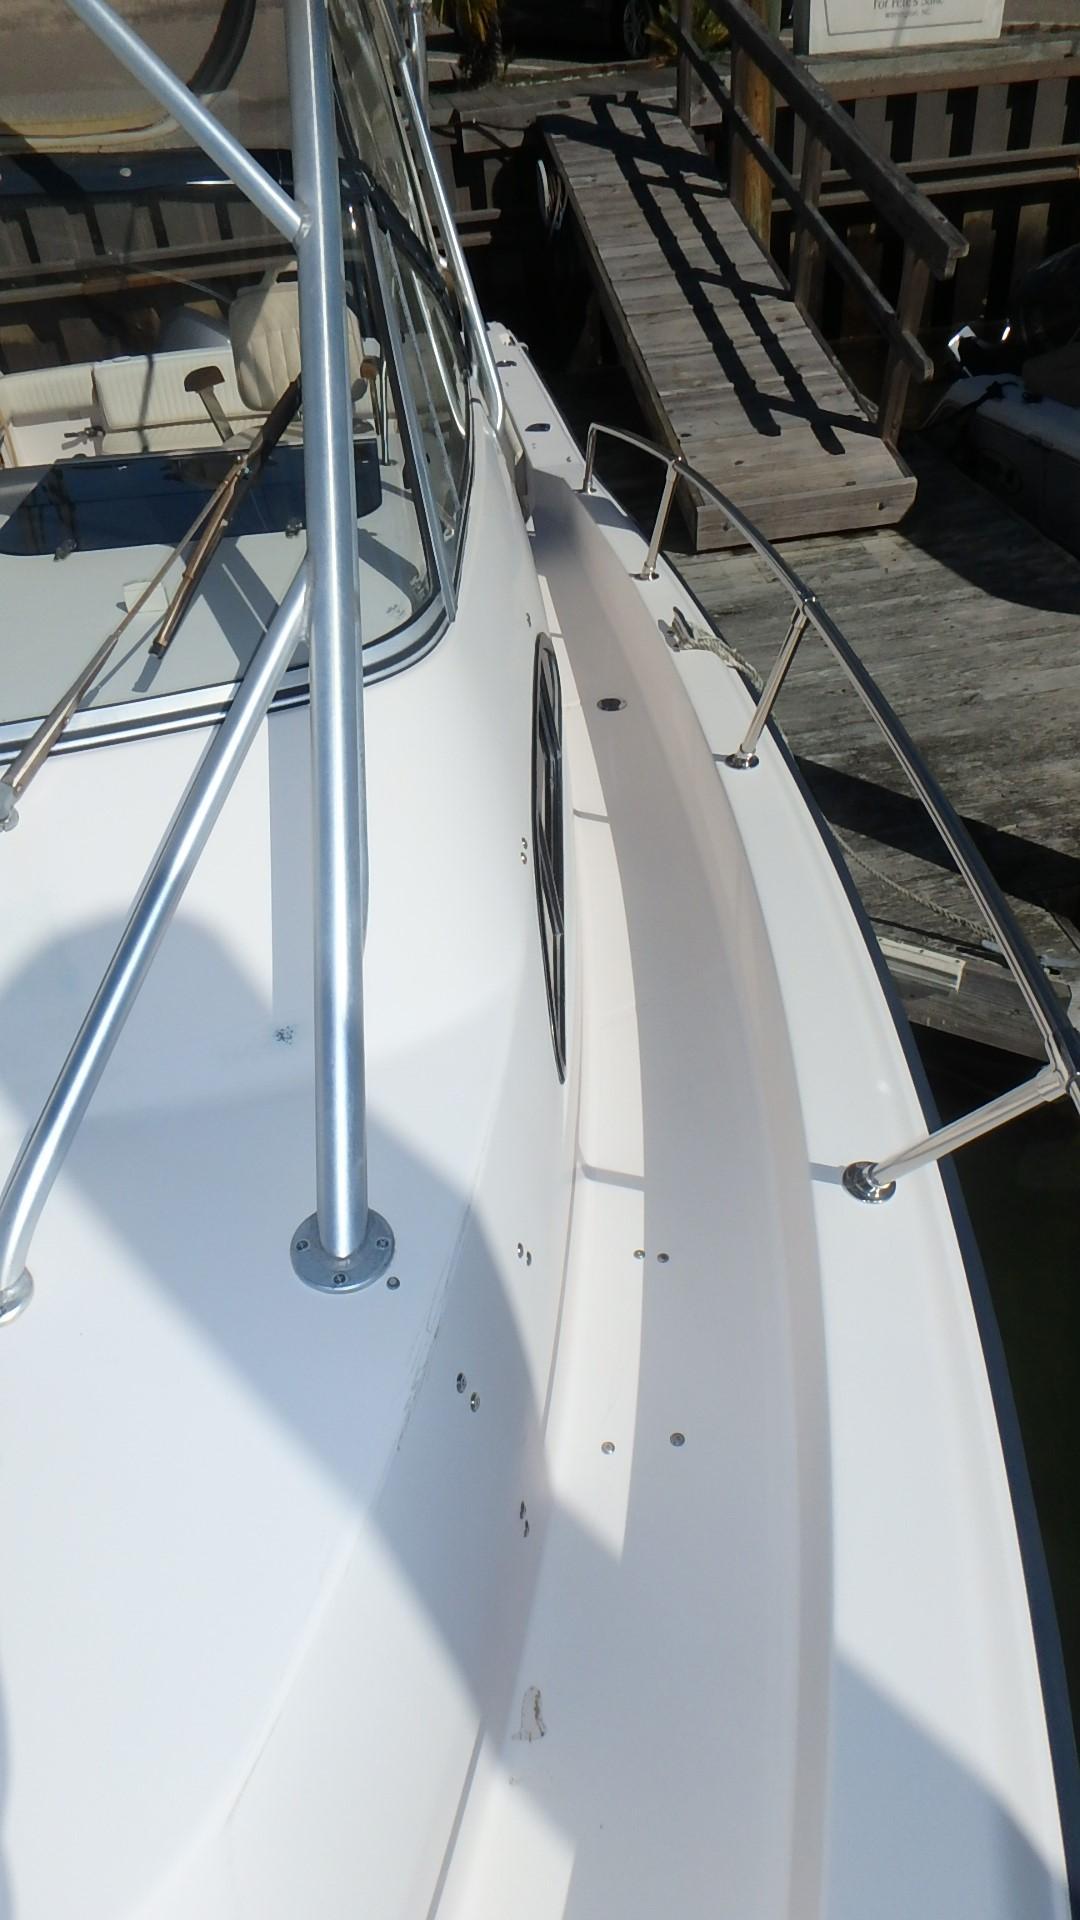 Grady-white 300 Marlin WA - Photo: #54